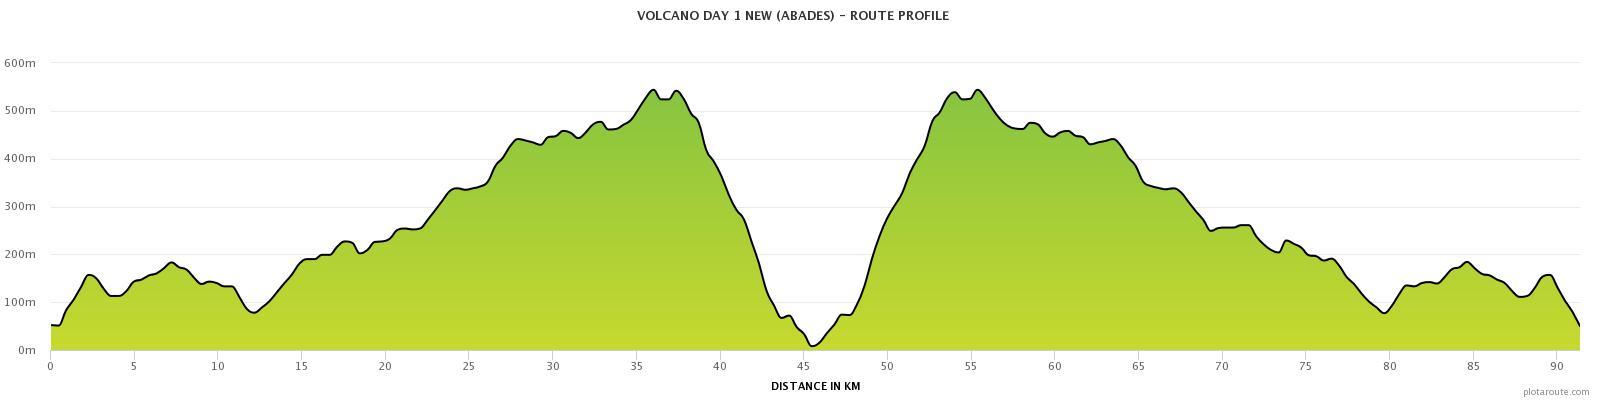 volcano-01-day